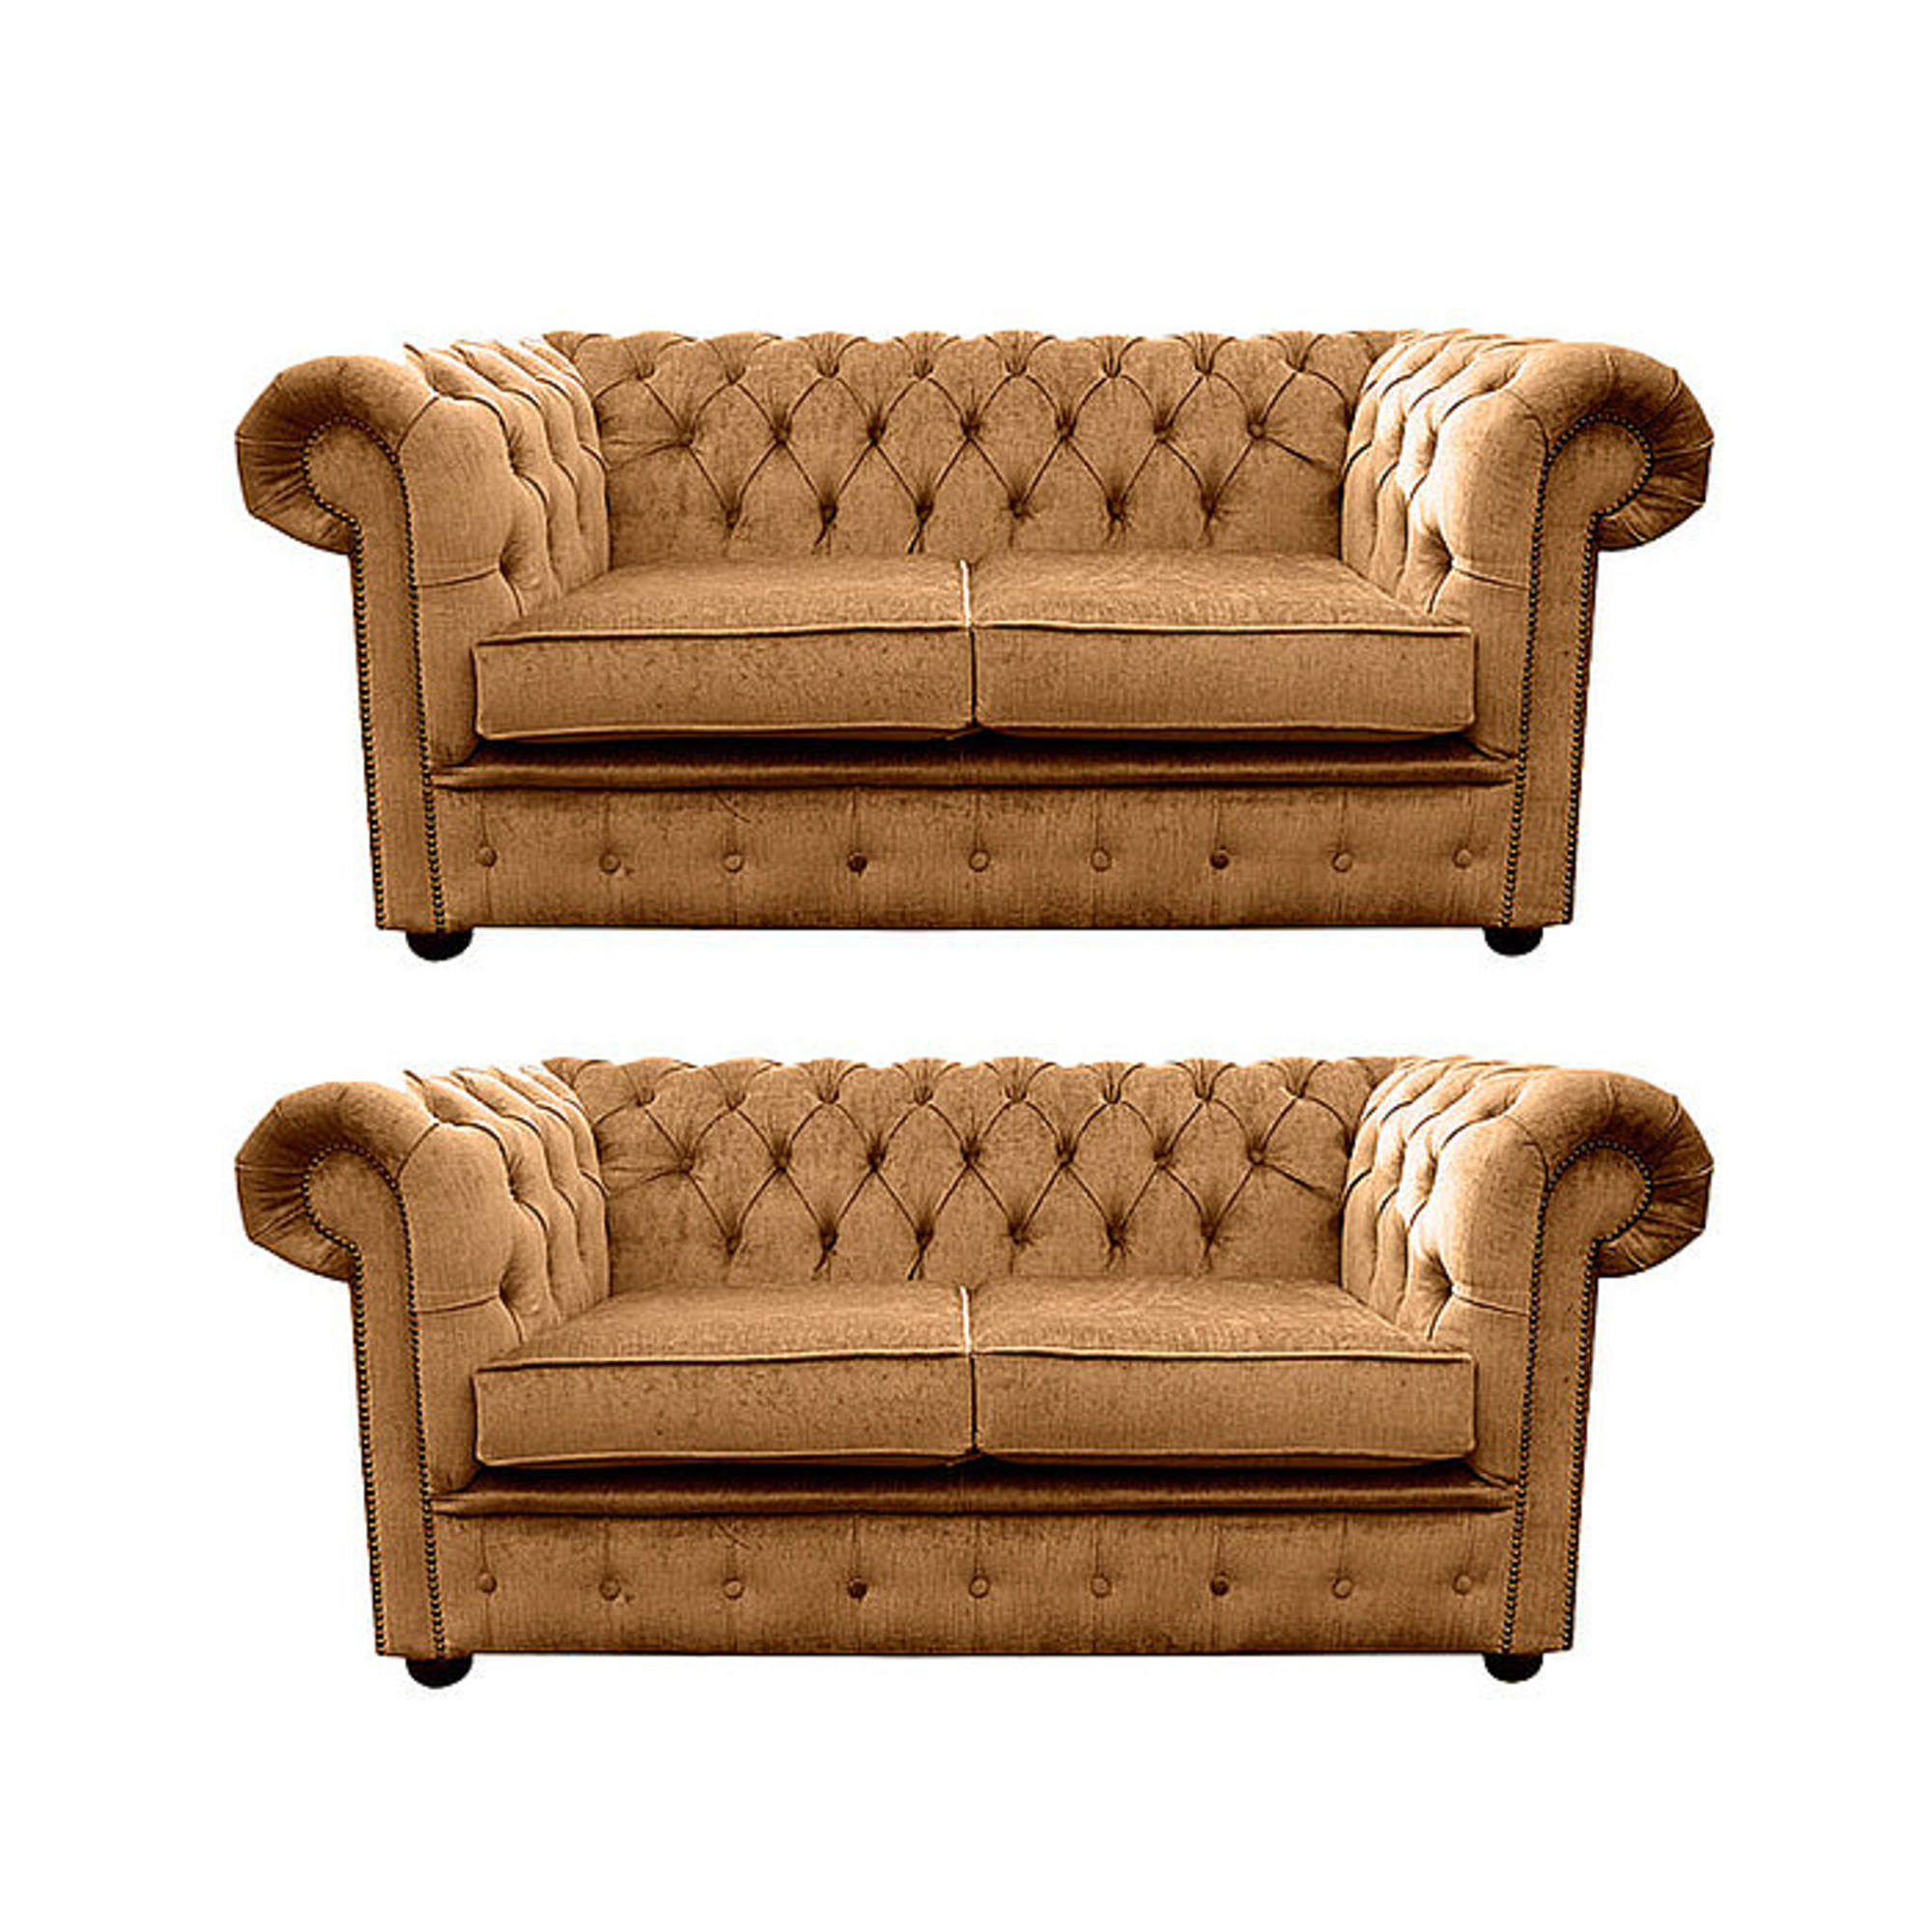 Chesterfield 2 Seater + 2 Seater Settee Harmony Gold Velvet Sofa Suite Offer